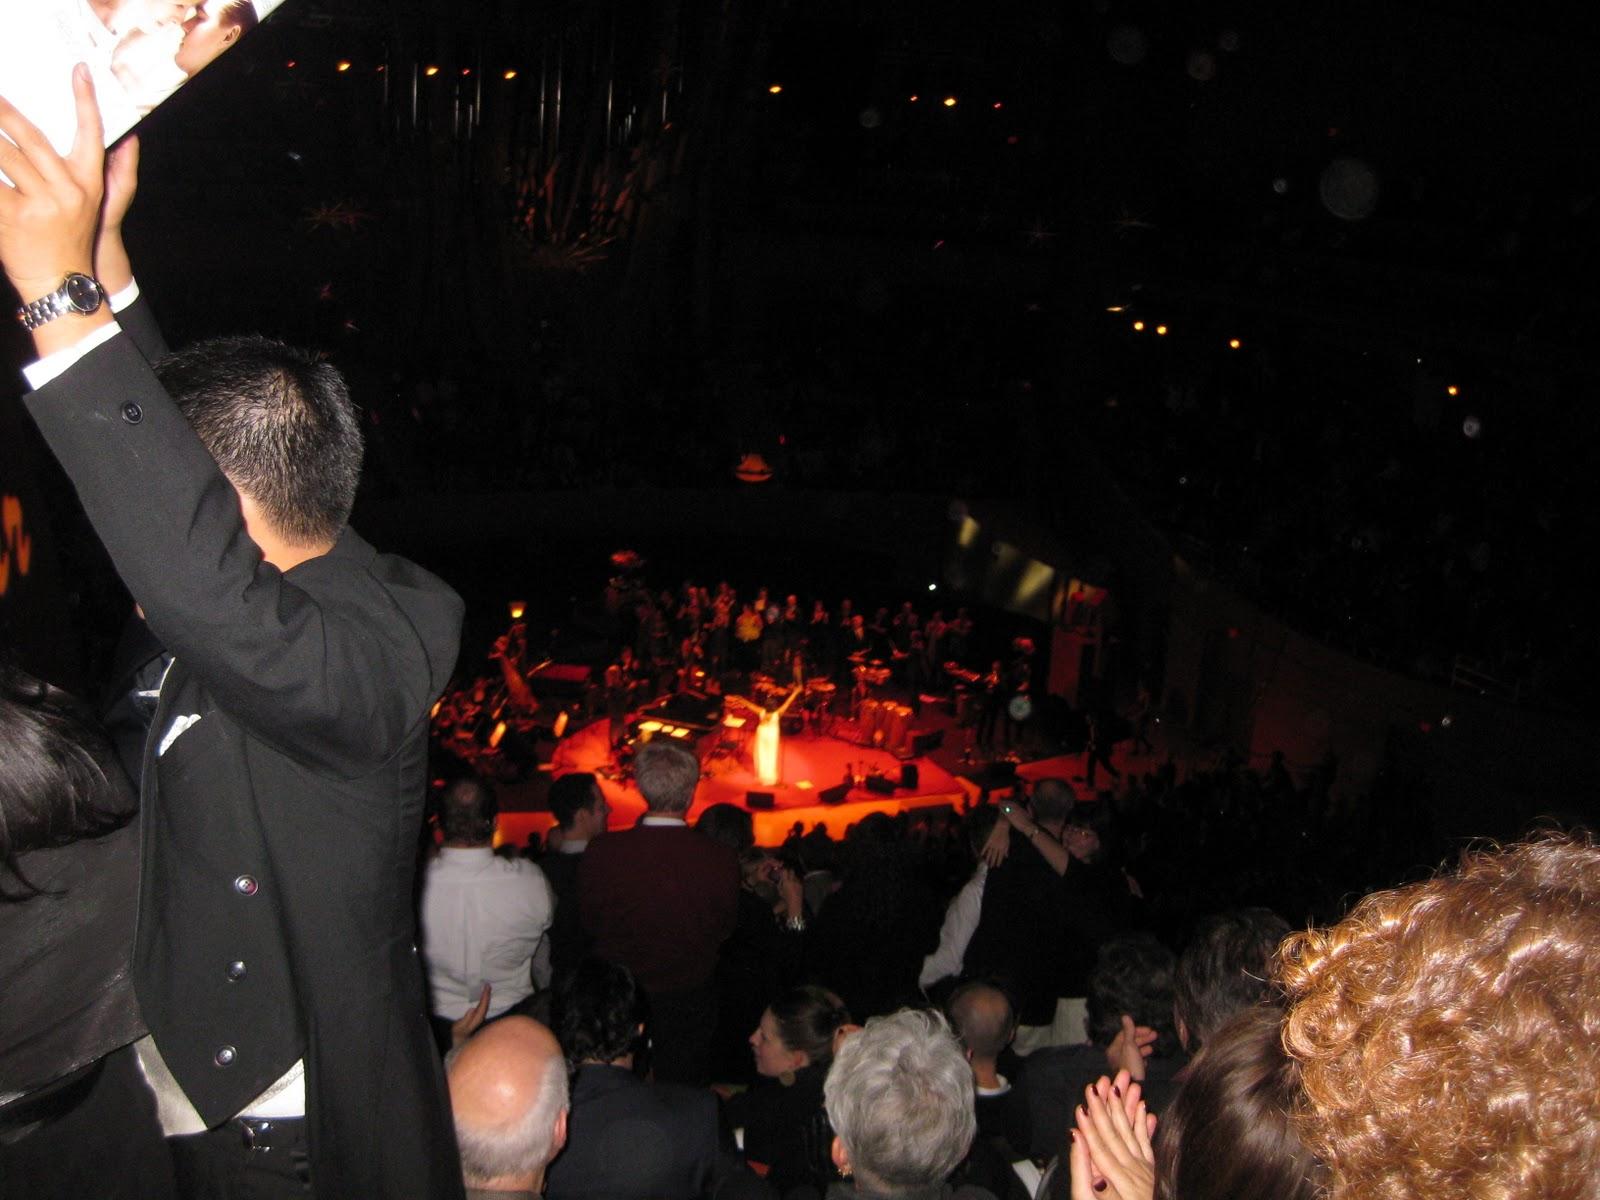 http://4.bp.blogspot.com/_Qn90qvGVEGM/TN4WAlPkpLI/AAAAAAAAGao/OVQ1aRYBuhw/s1600/Pink+Martini+at+the+Walt+Disney+Concert+Hall+%25288%2529.JPG